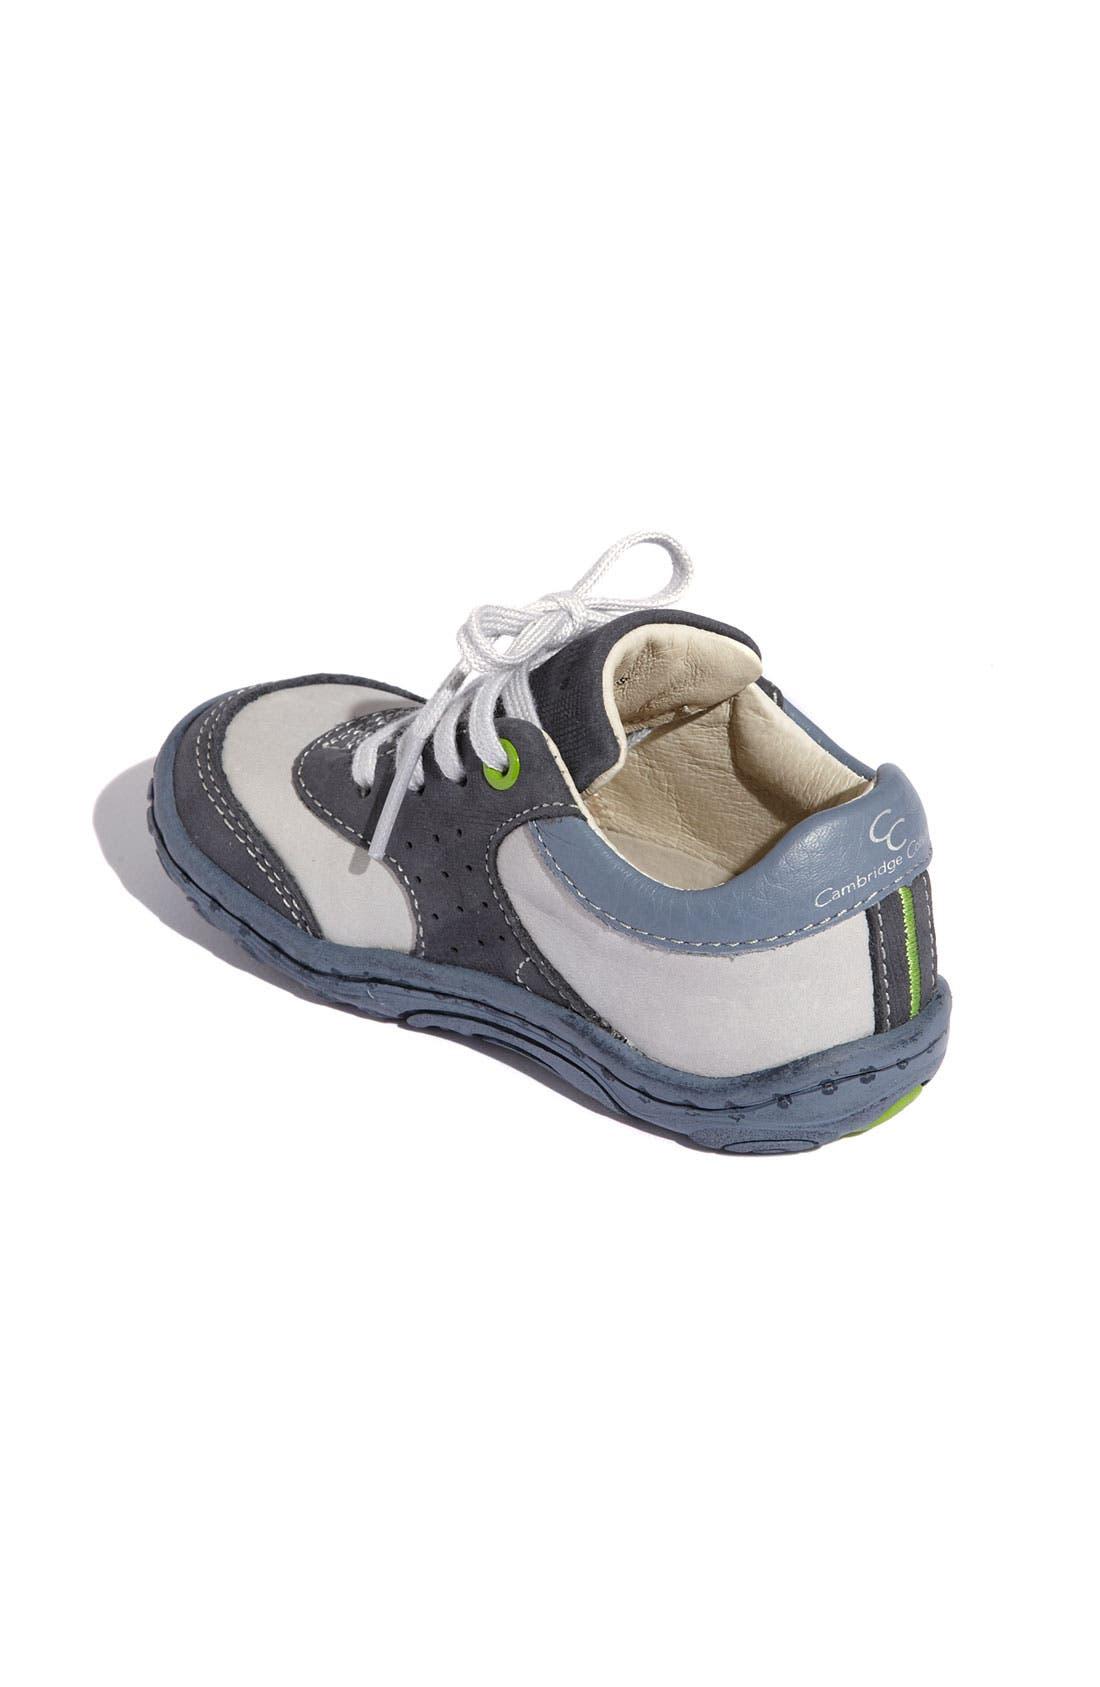 Alternate Image 2  - Stride Rite 'Charles' Sneaker (Baby, Walker & Toddler)